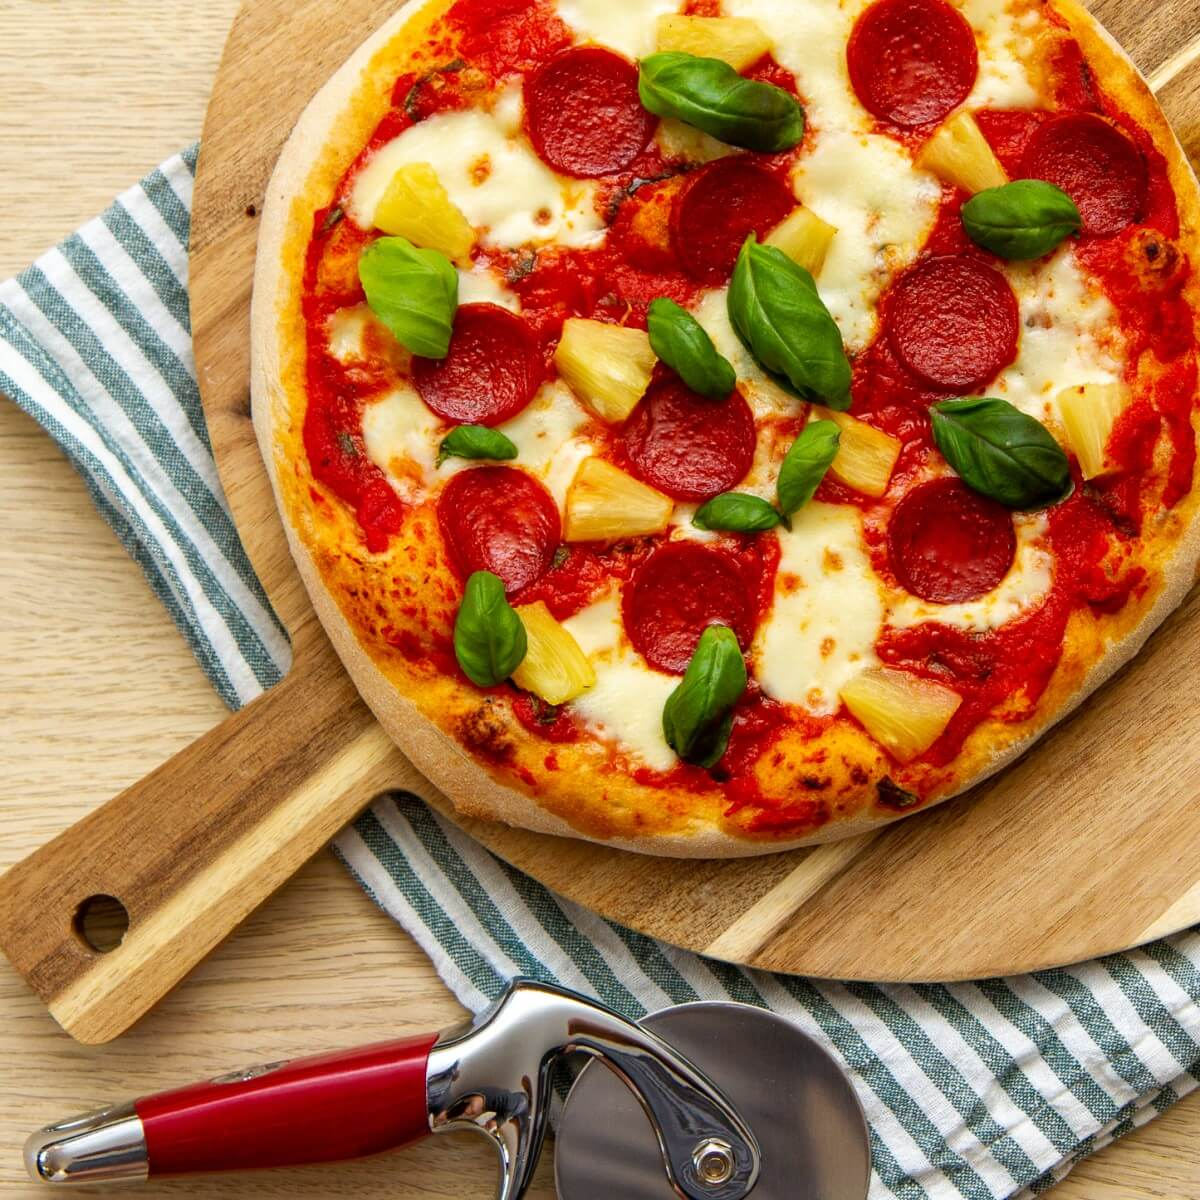 Pizza pepperoni og ananas